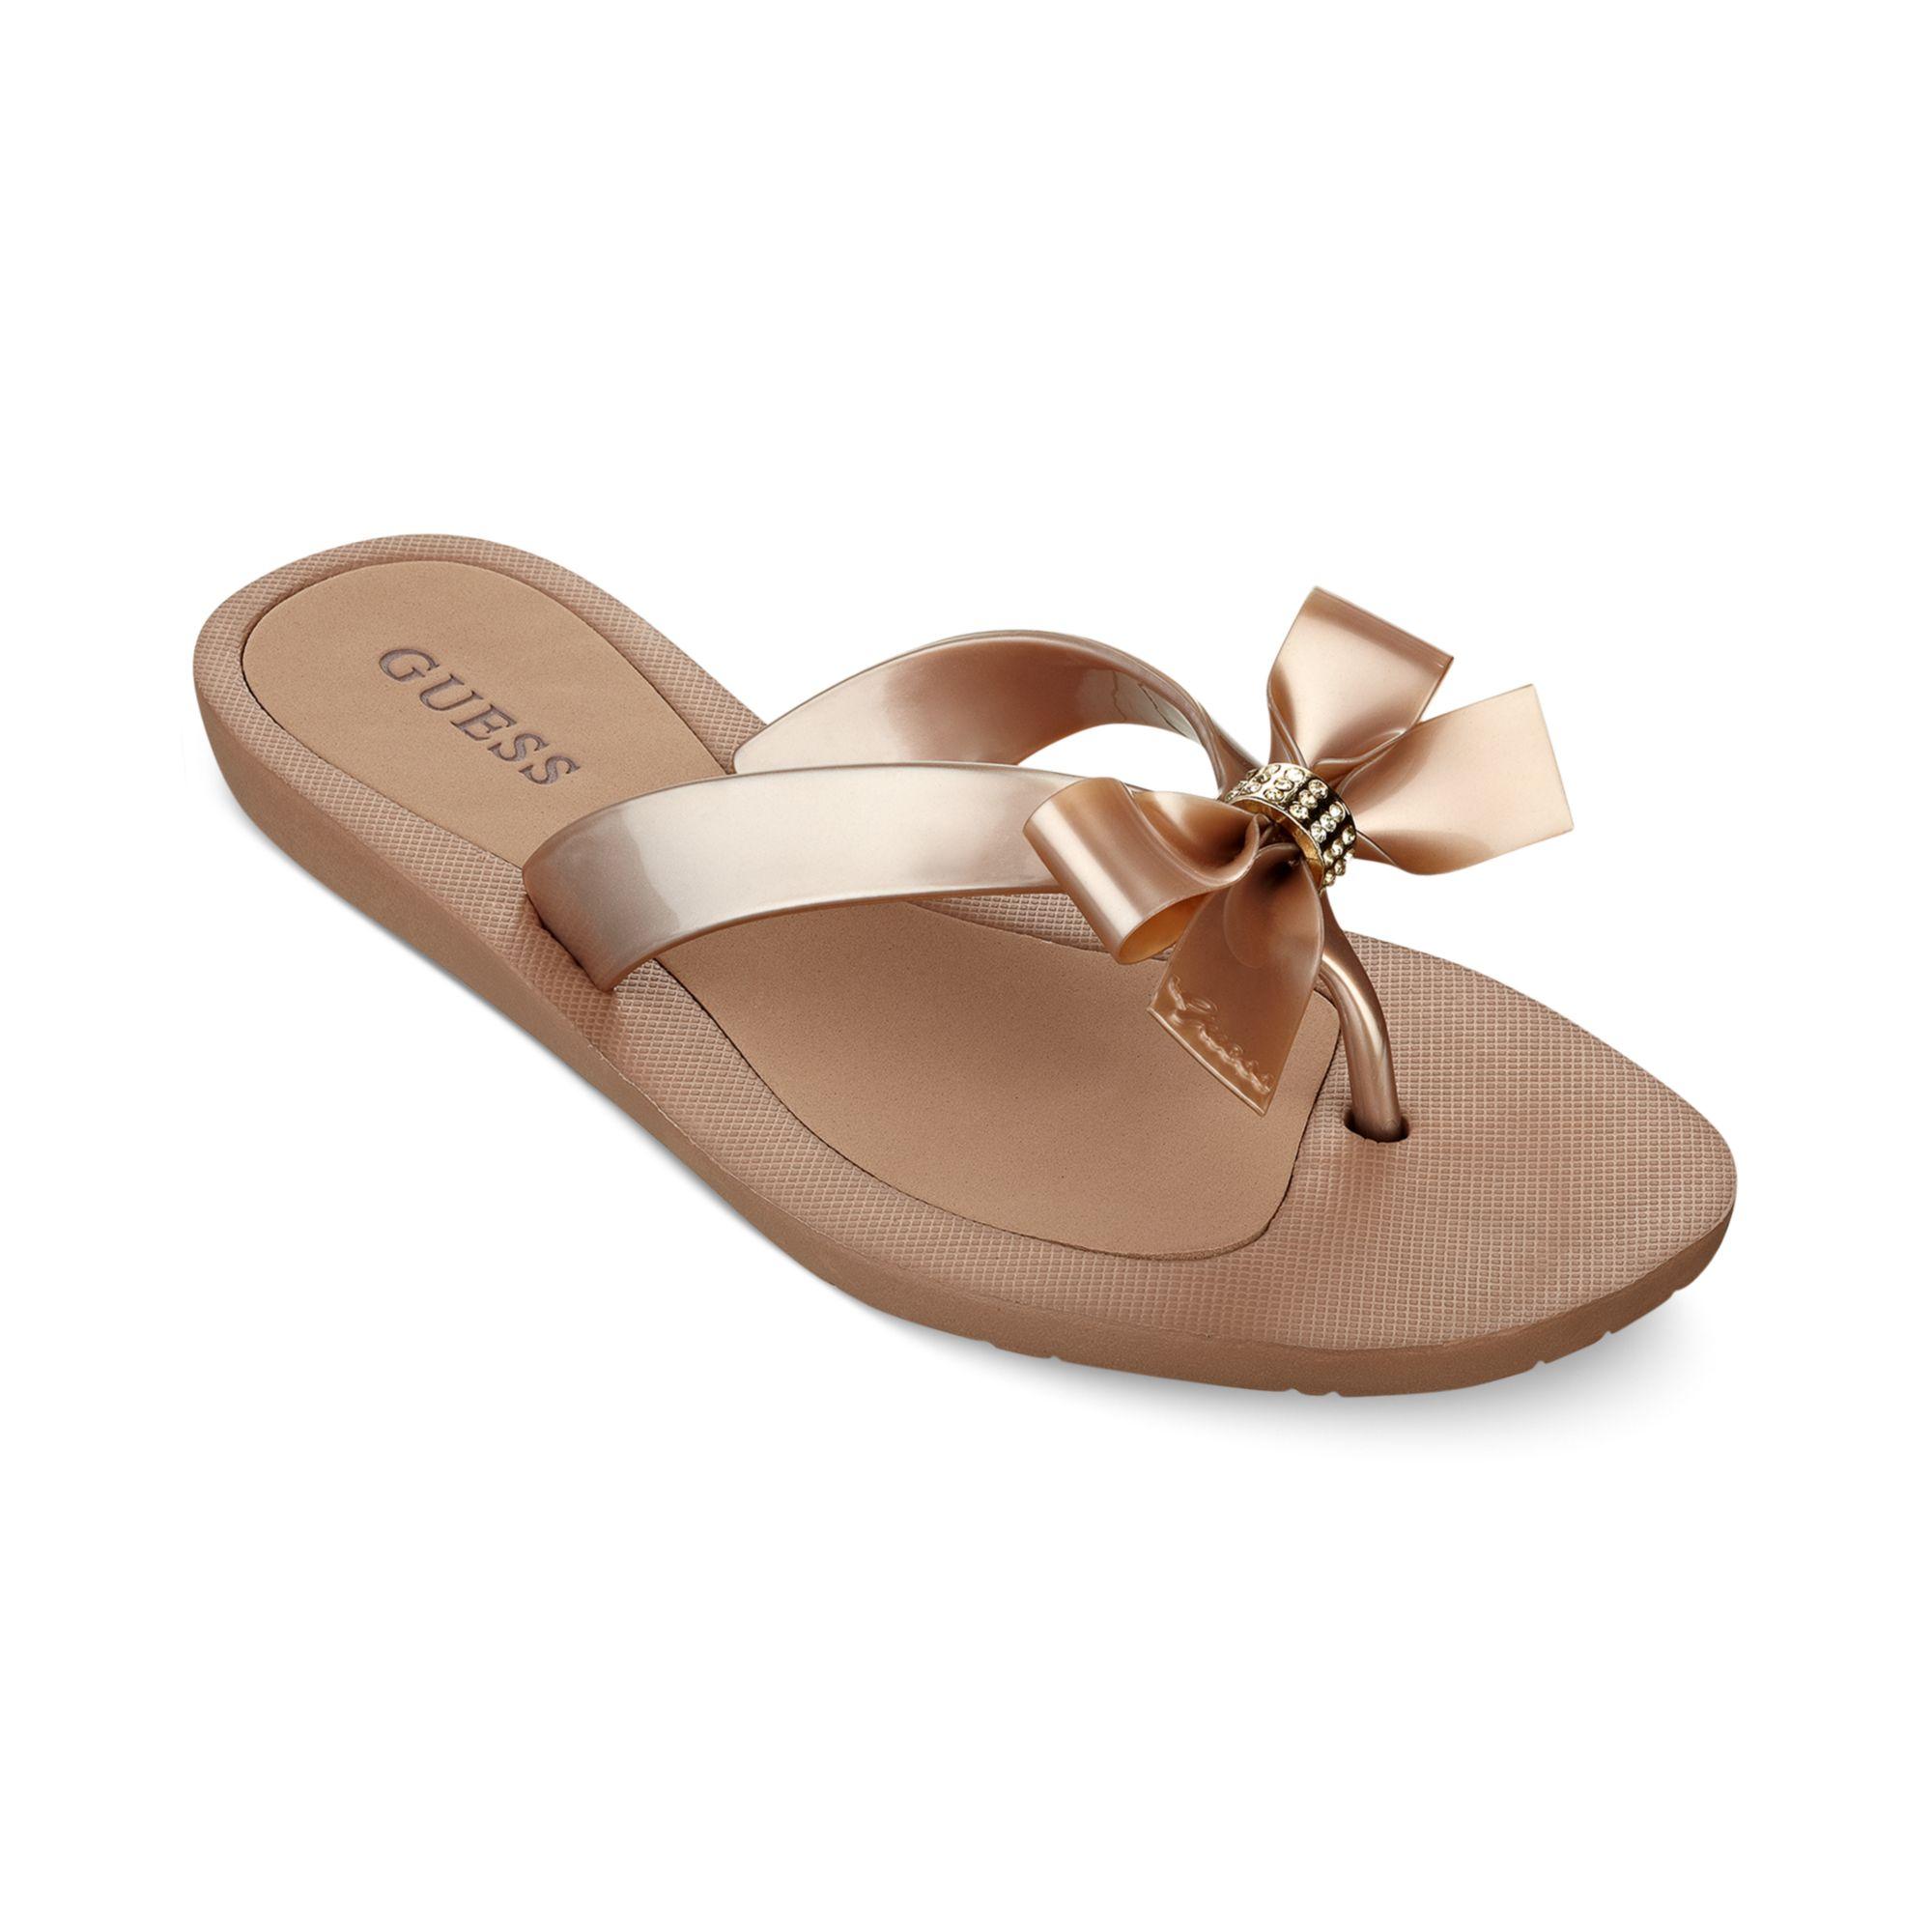 3ebe1aa5d Lyst - Guess Womens Tutu Thong Sandals in Metallic